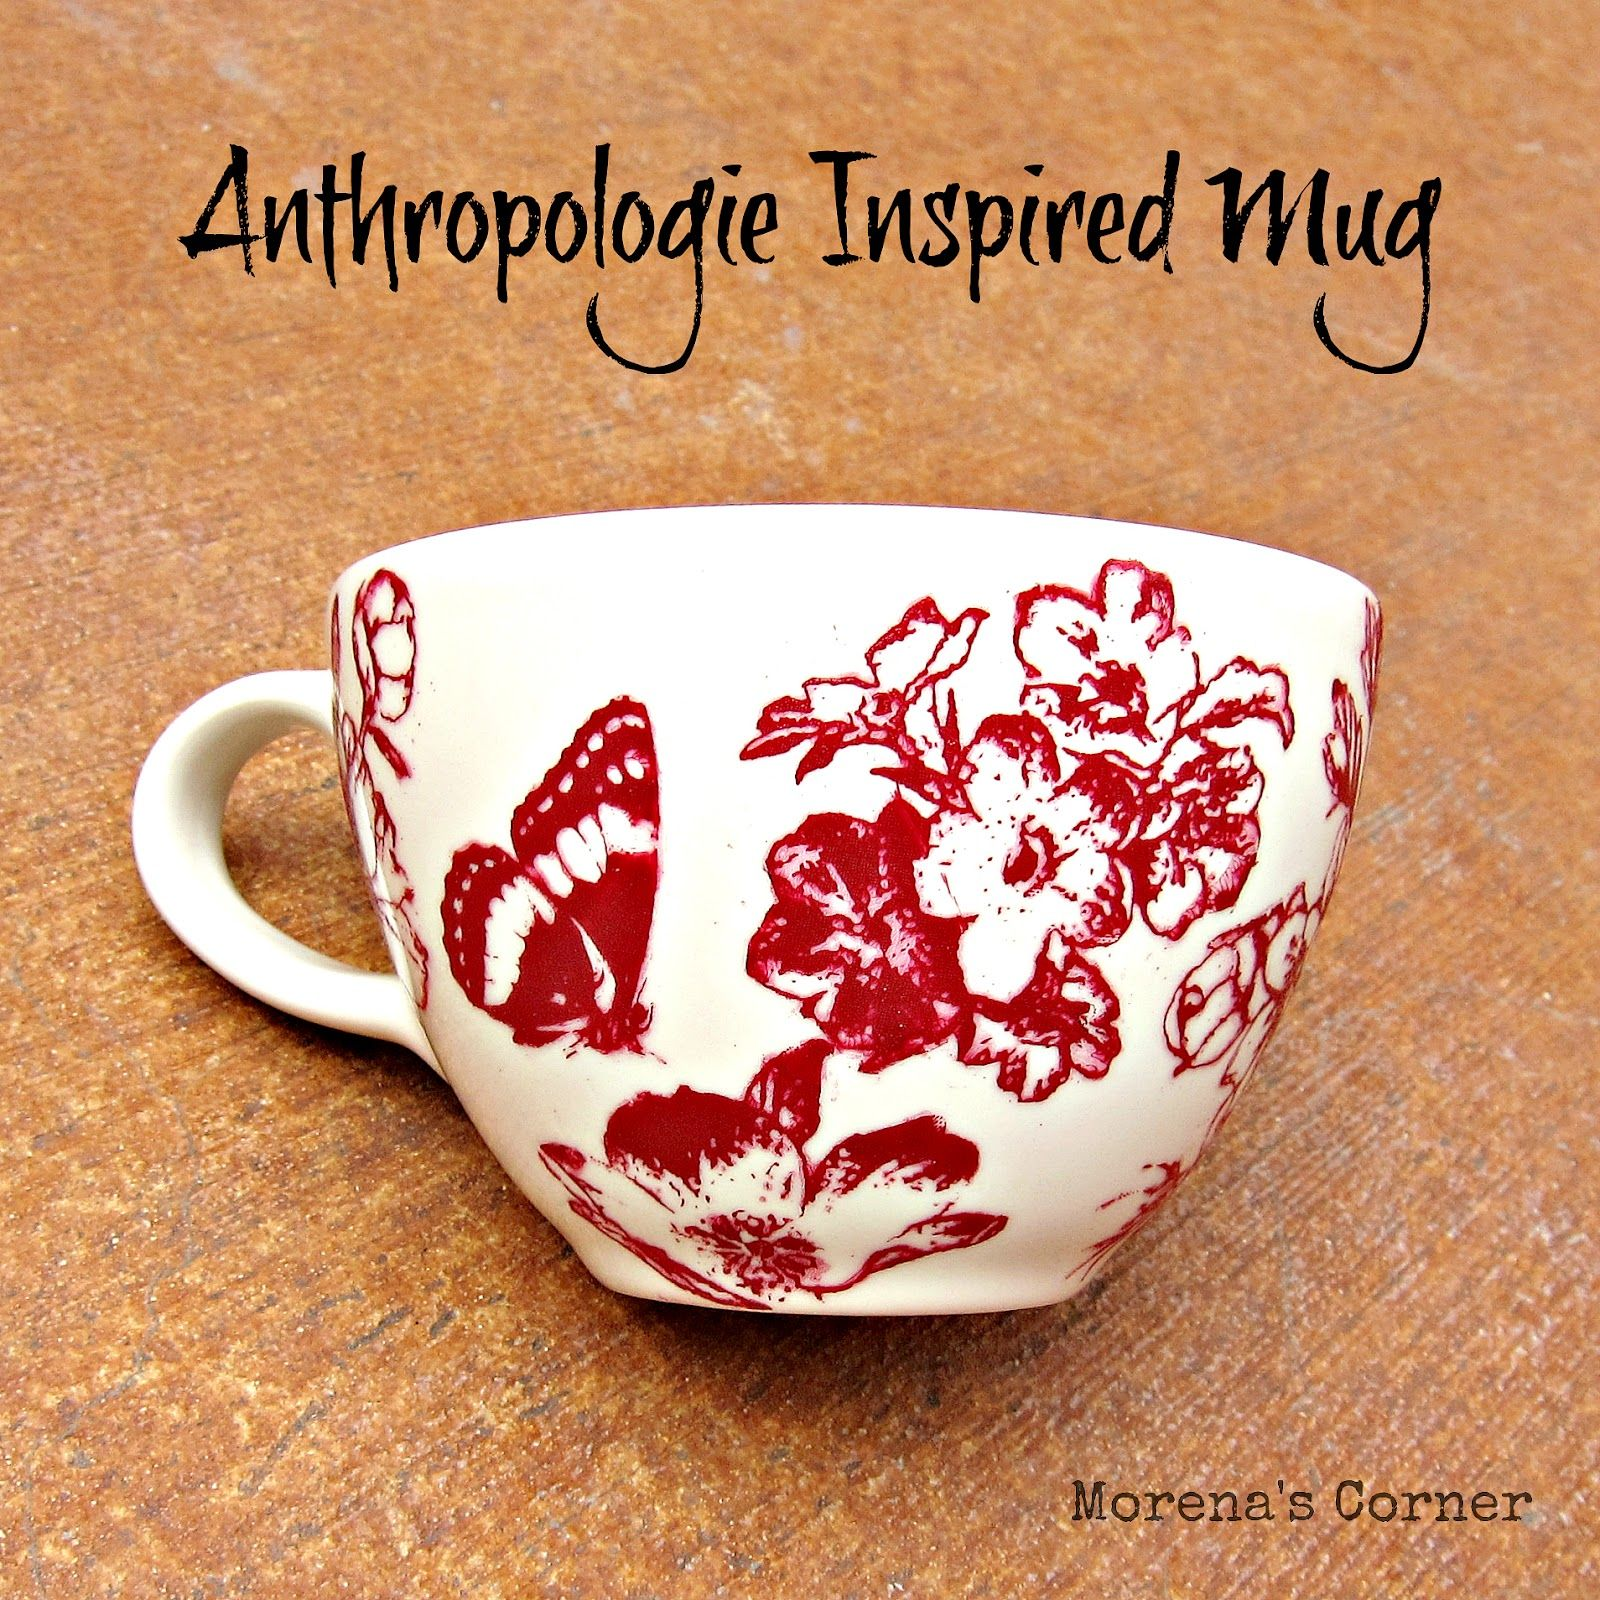 Anthro Inspired Mug made with Martha Stewart Glass Paints